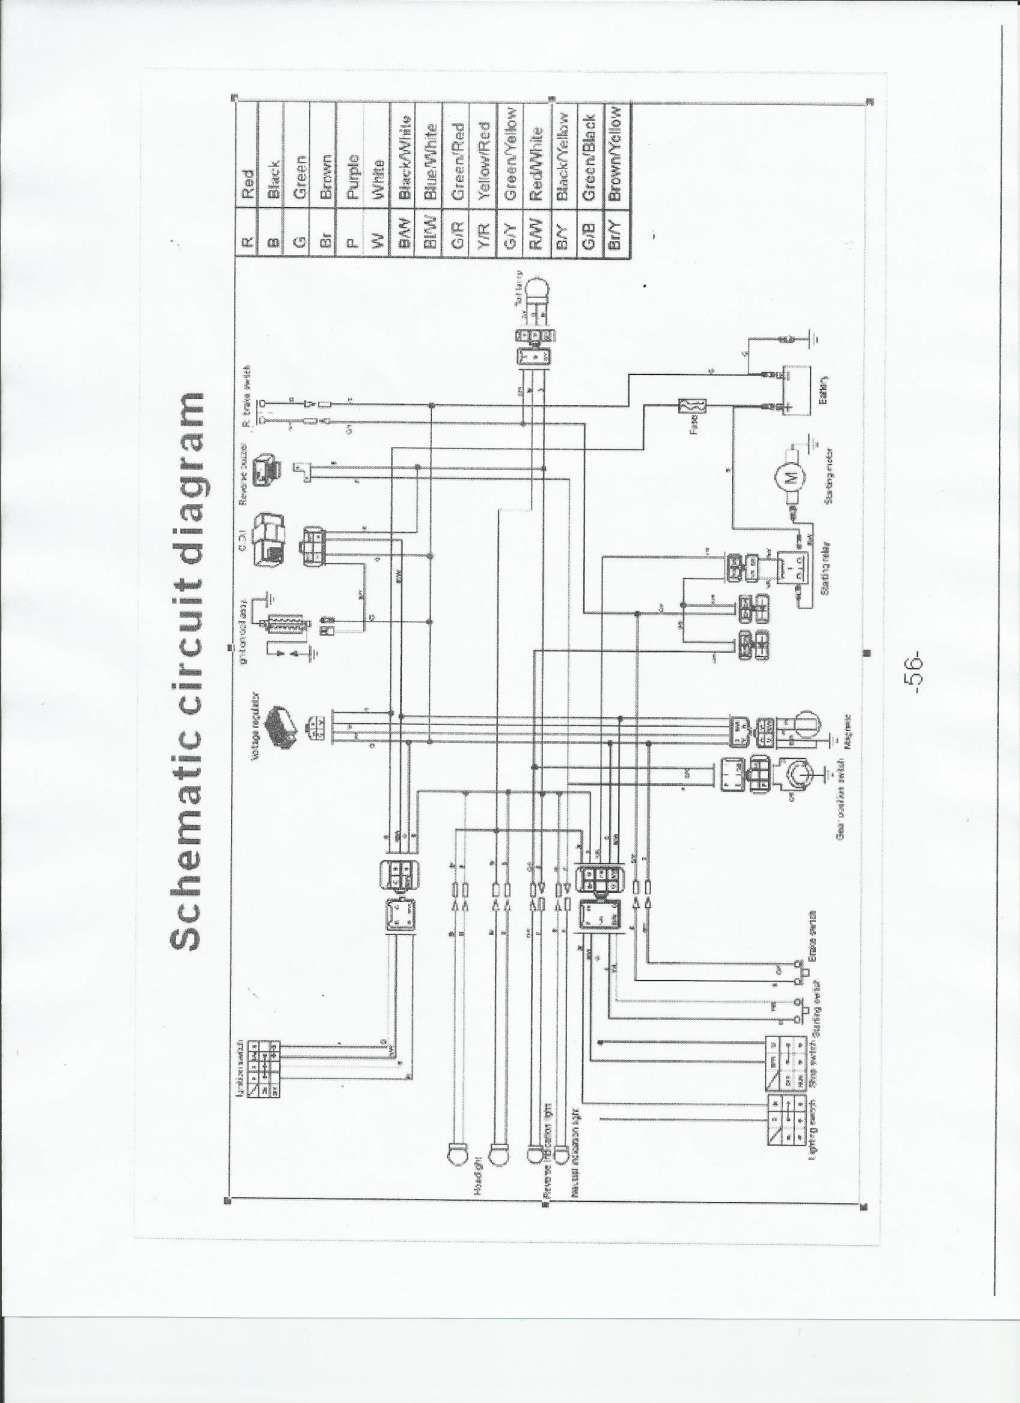 Chinese Atv Wiring Diagram : chinese, wiring, diagram, 150Cc, Chinese, Motorcycle, Wiring, Diagram, Wiringg.net, Taotao, Diagram,